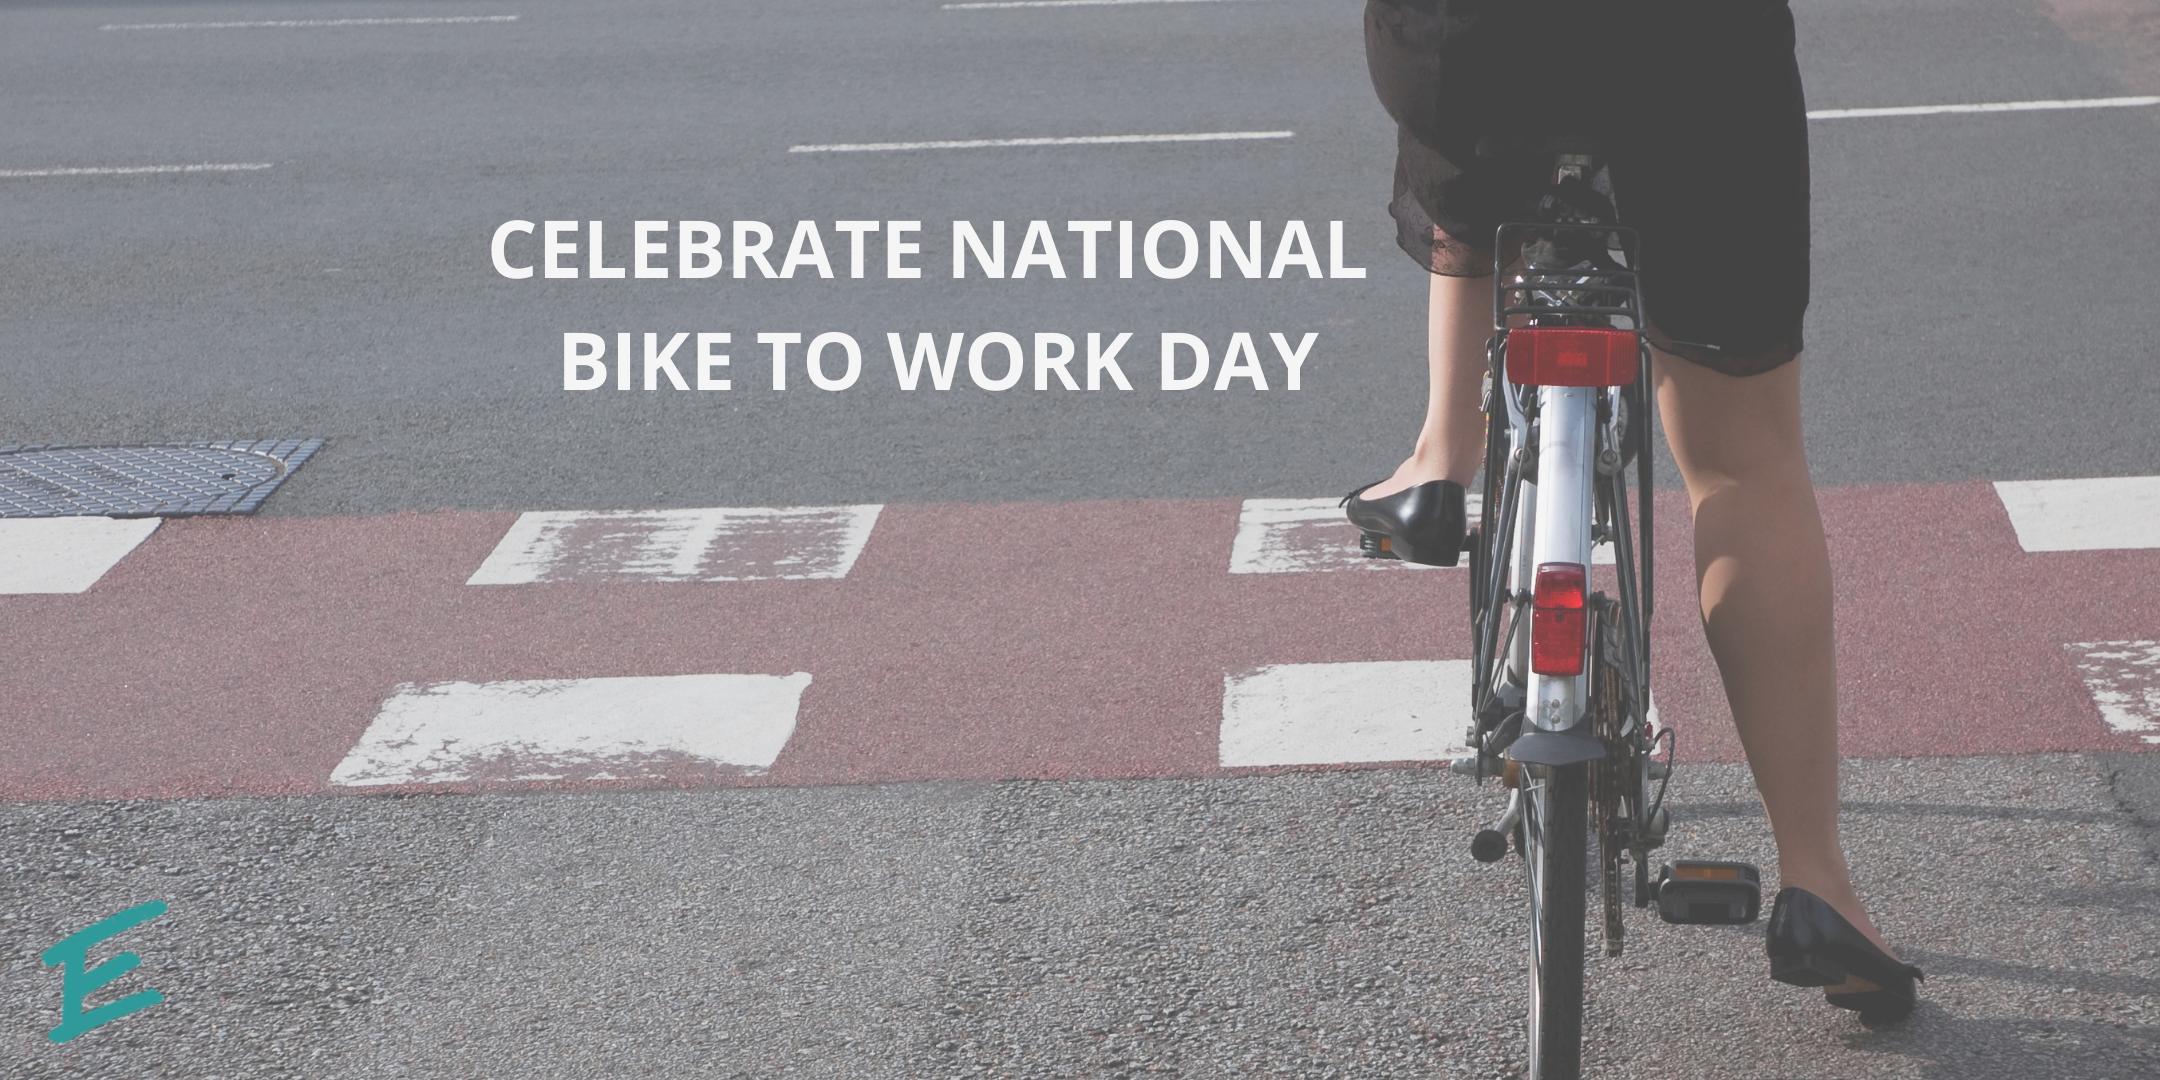 celebrate-national-bike-to-work-day